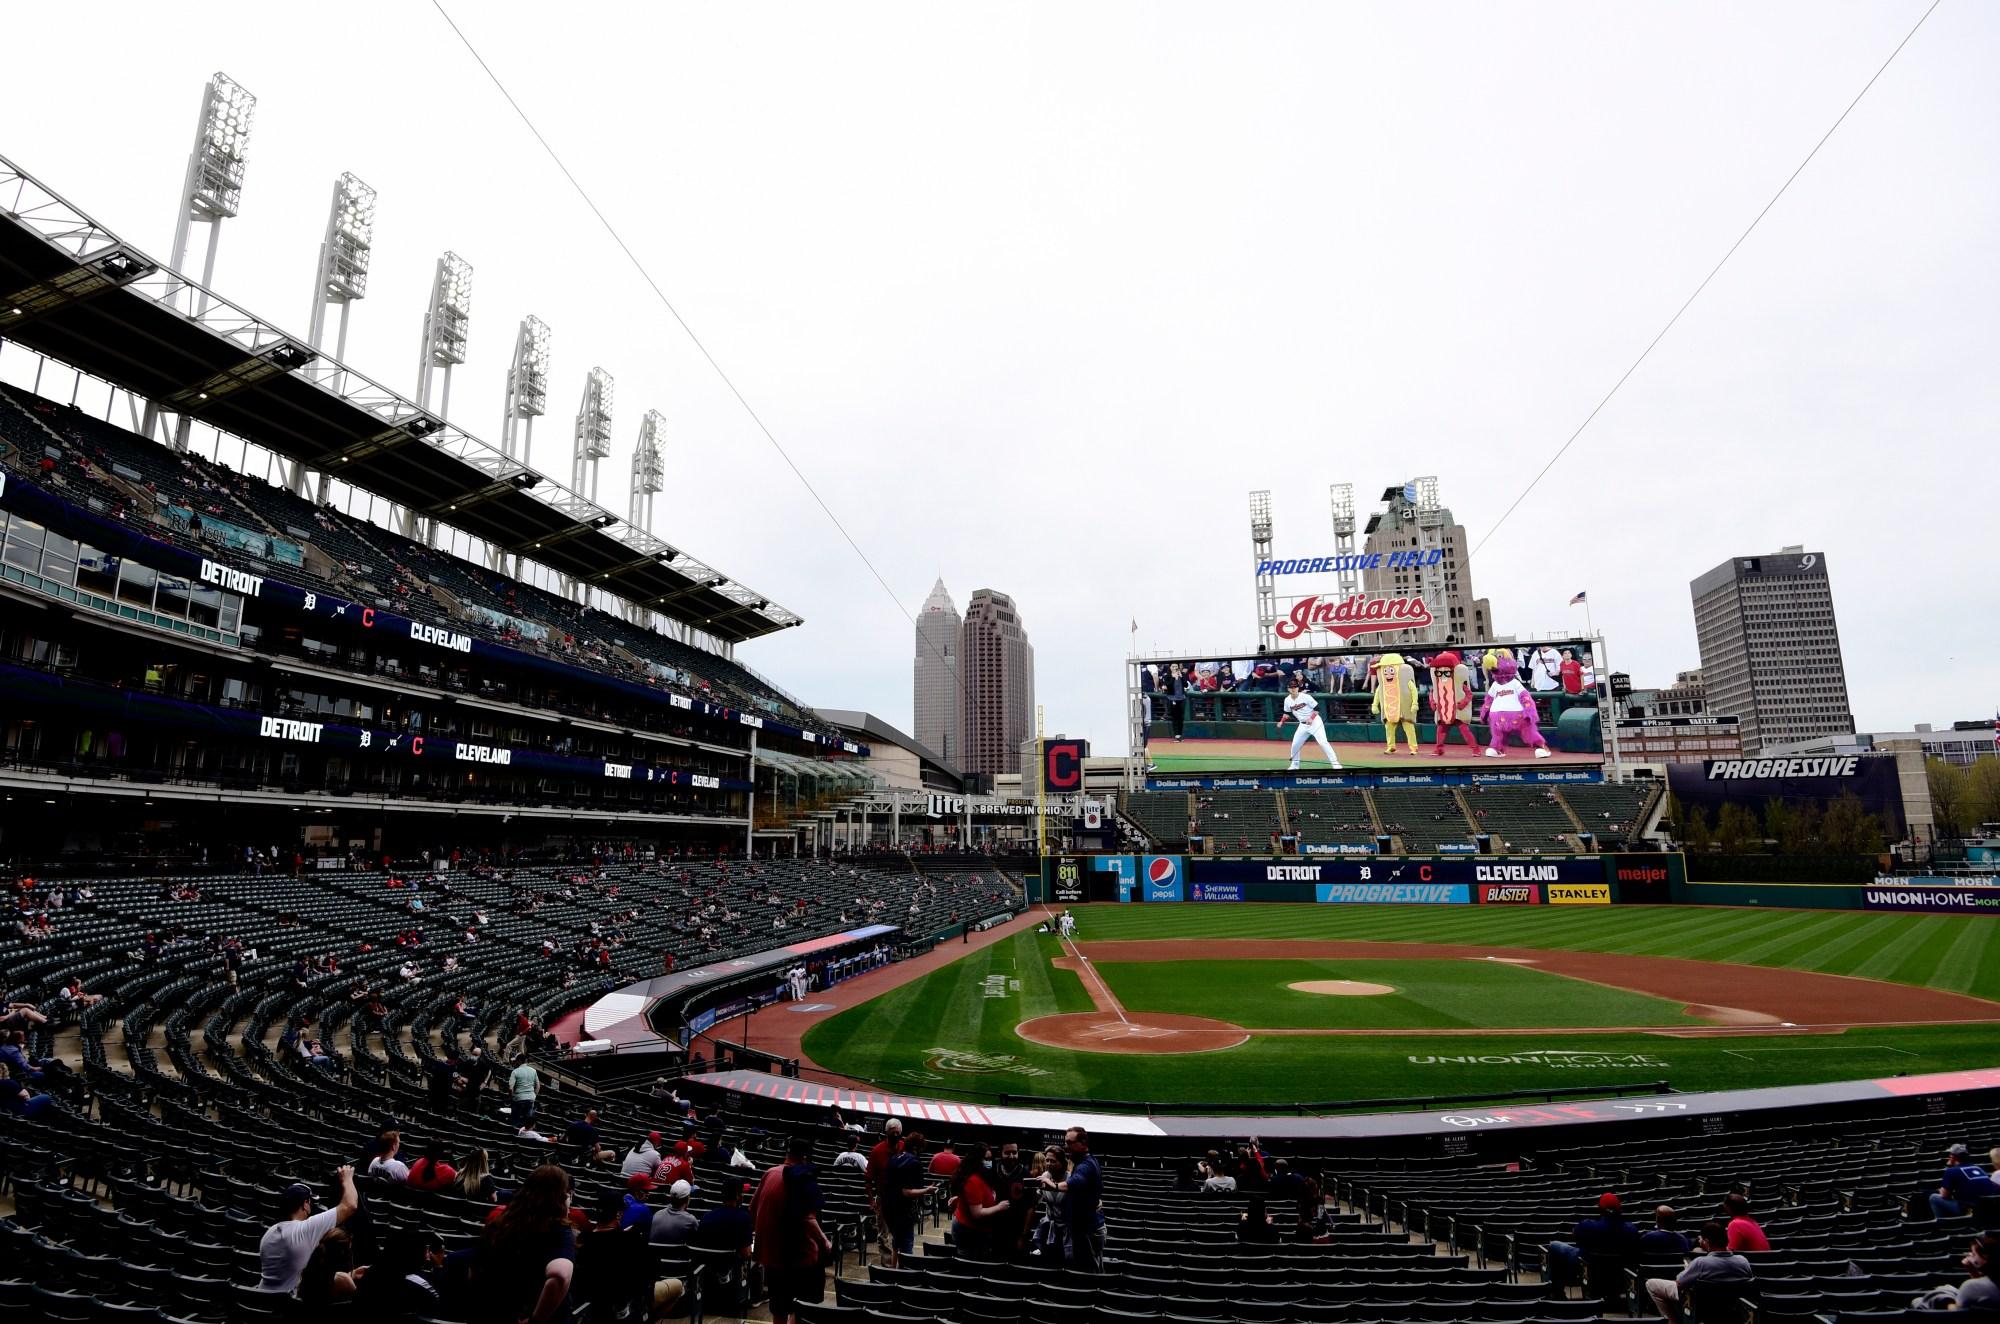 Cleveland Indians name change Guardians